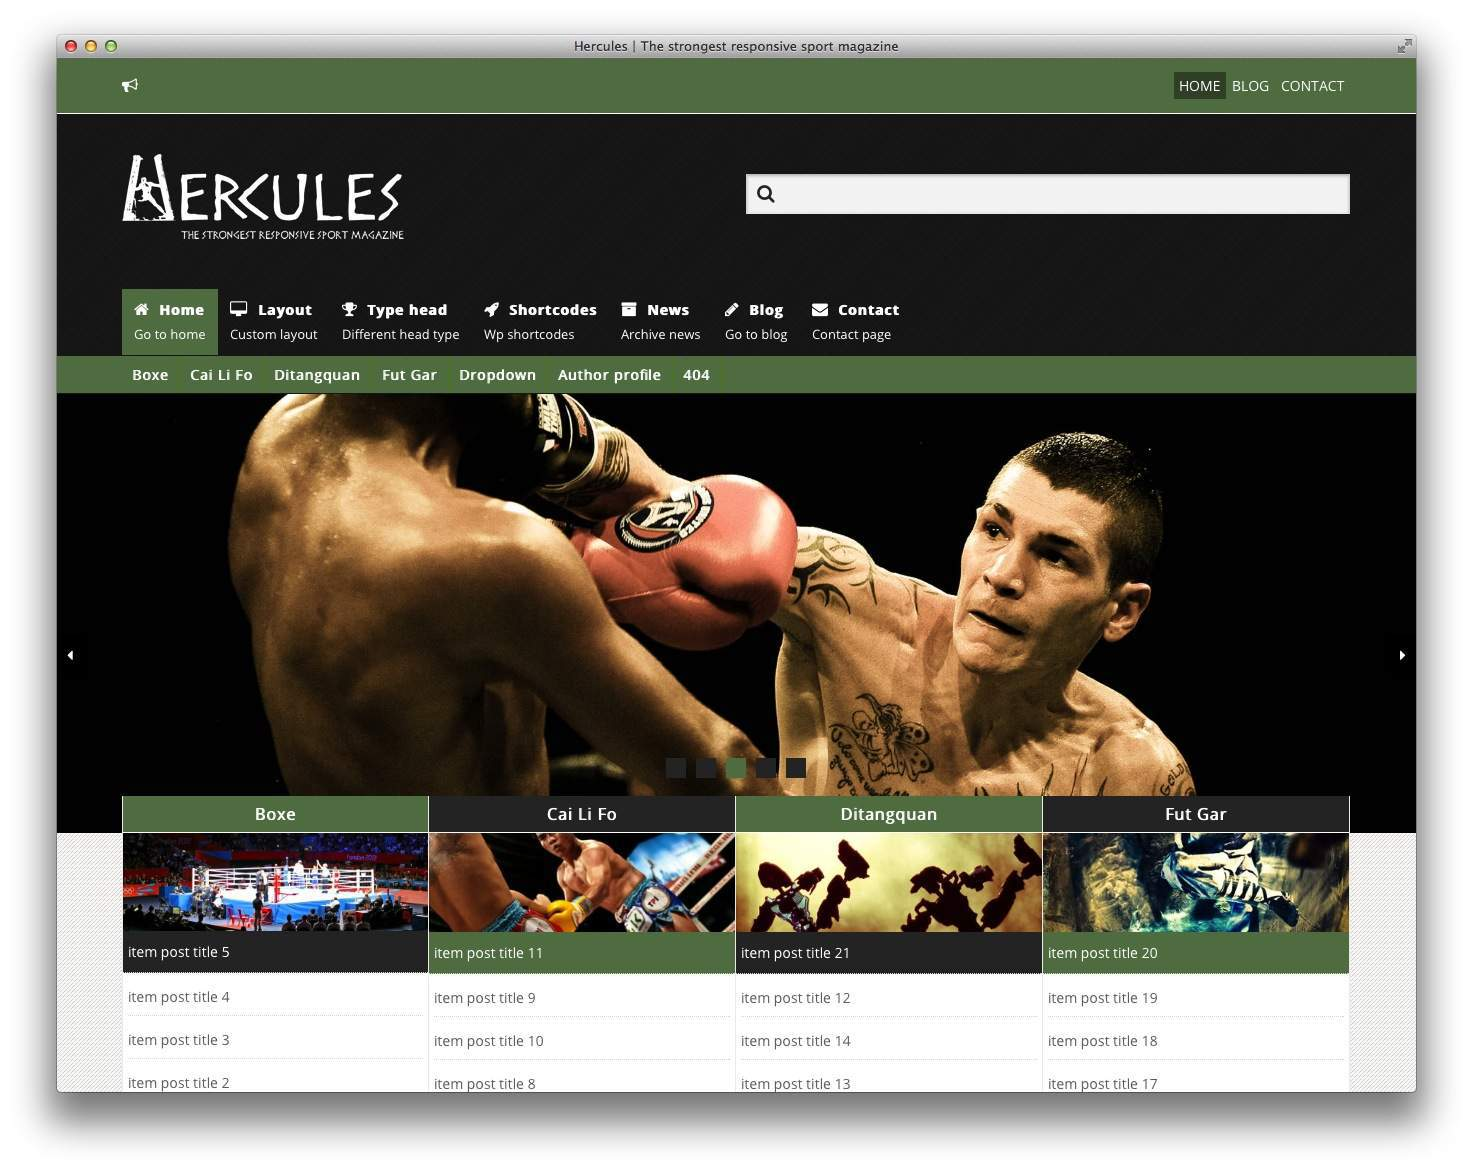 hercules-sports-magazine